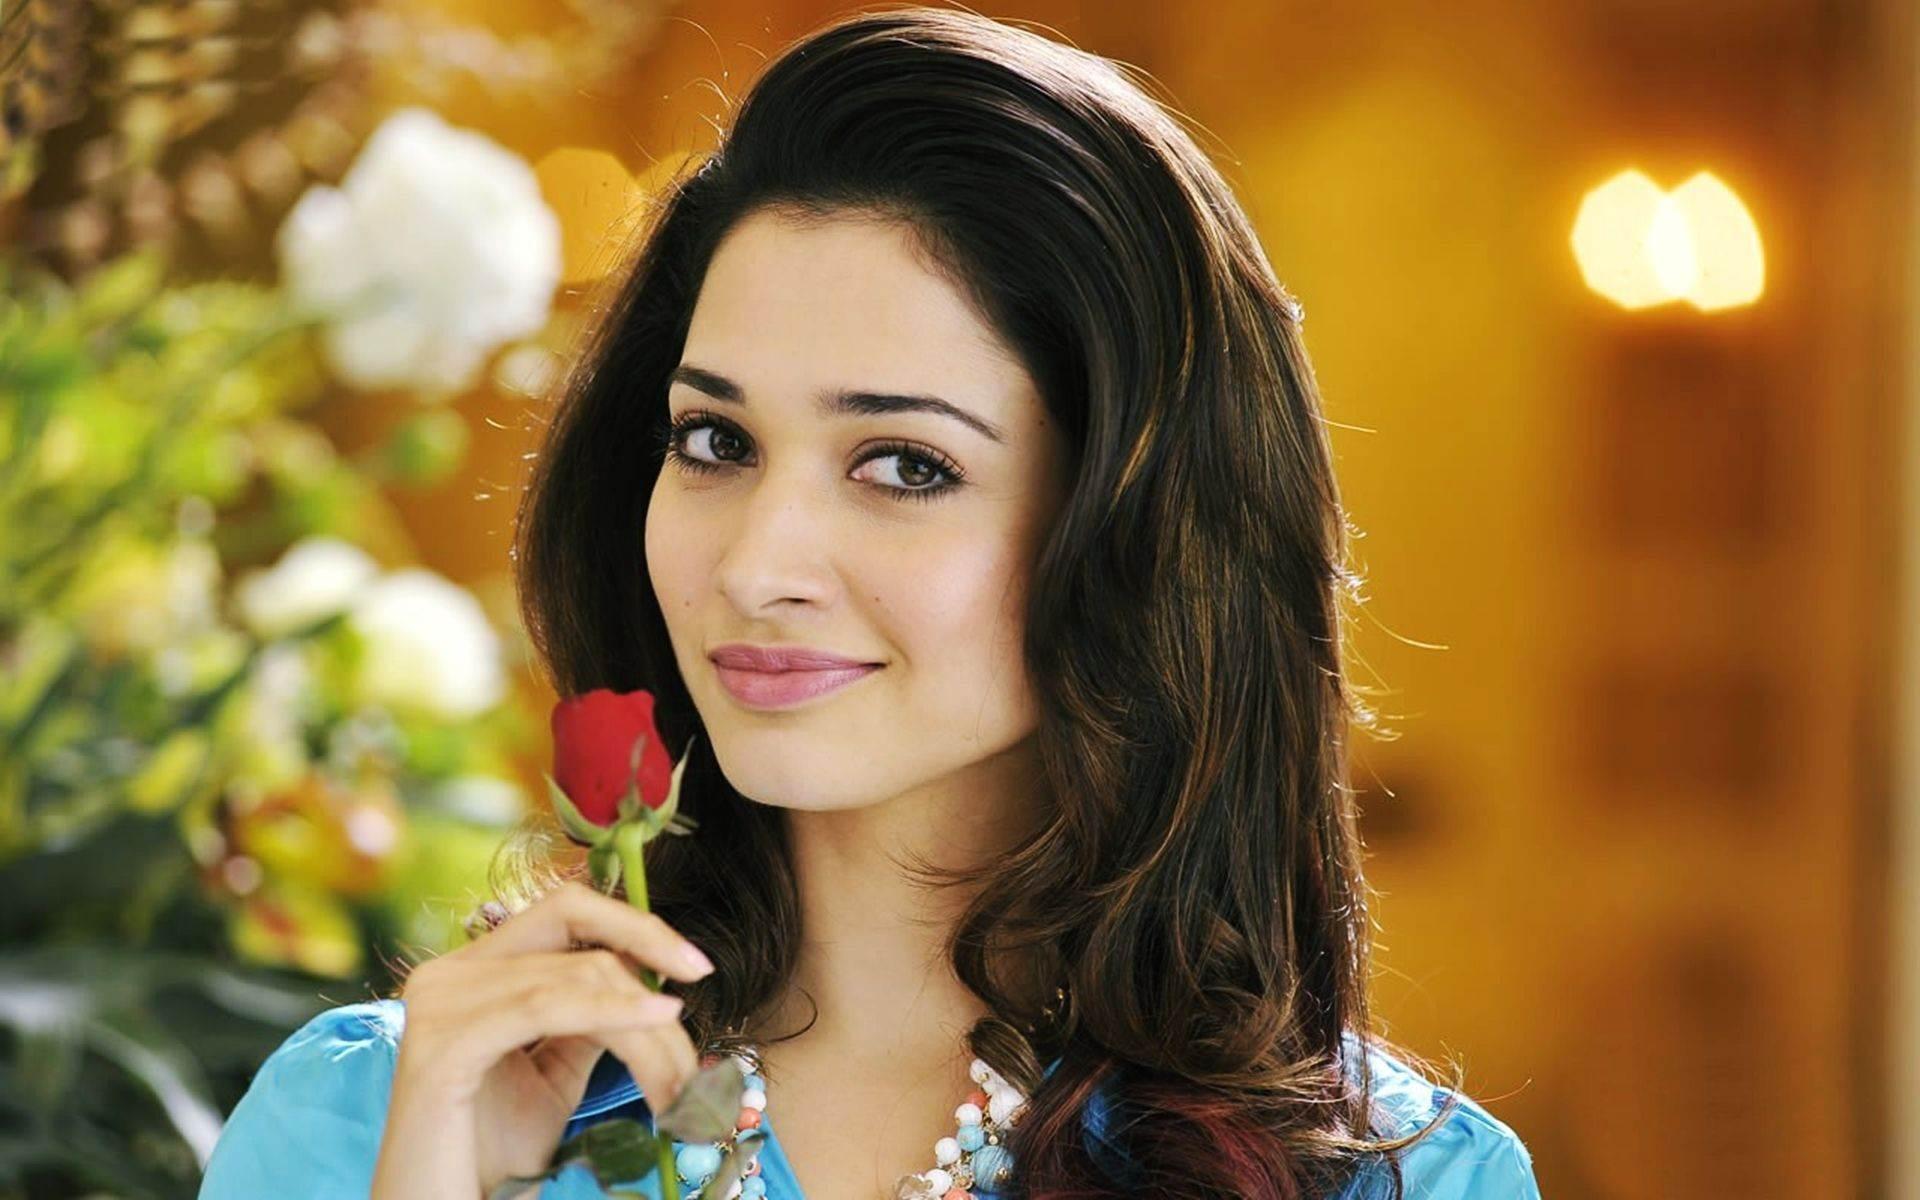 Katrina Kaif Pink Lips Cute Face Bollywood Actress Wallpaper 1920x1200